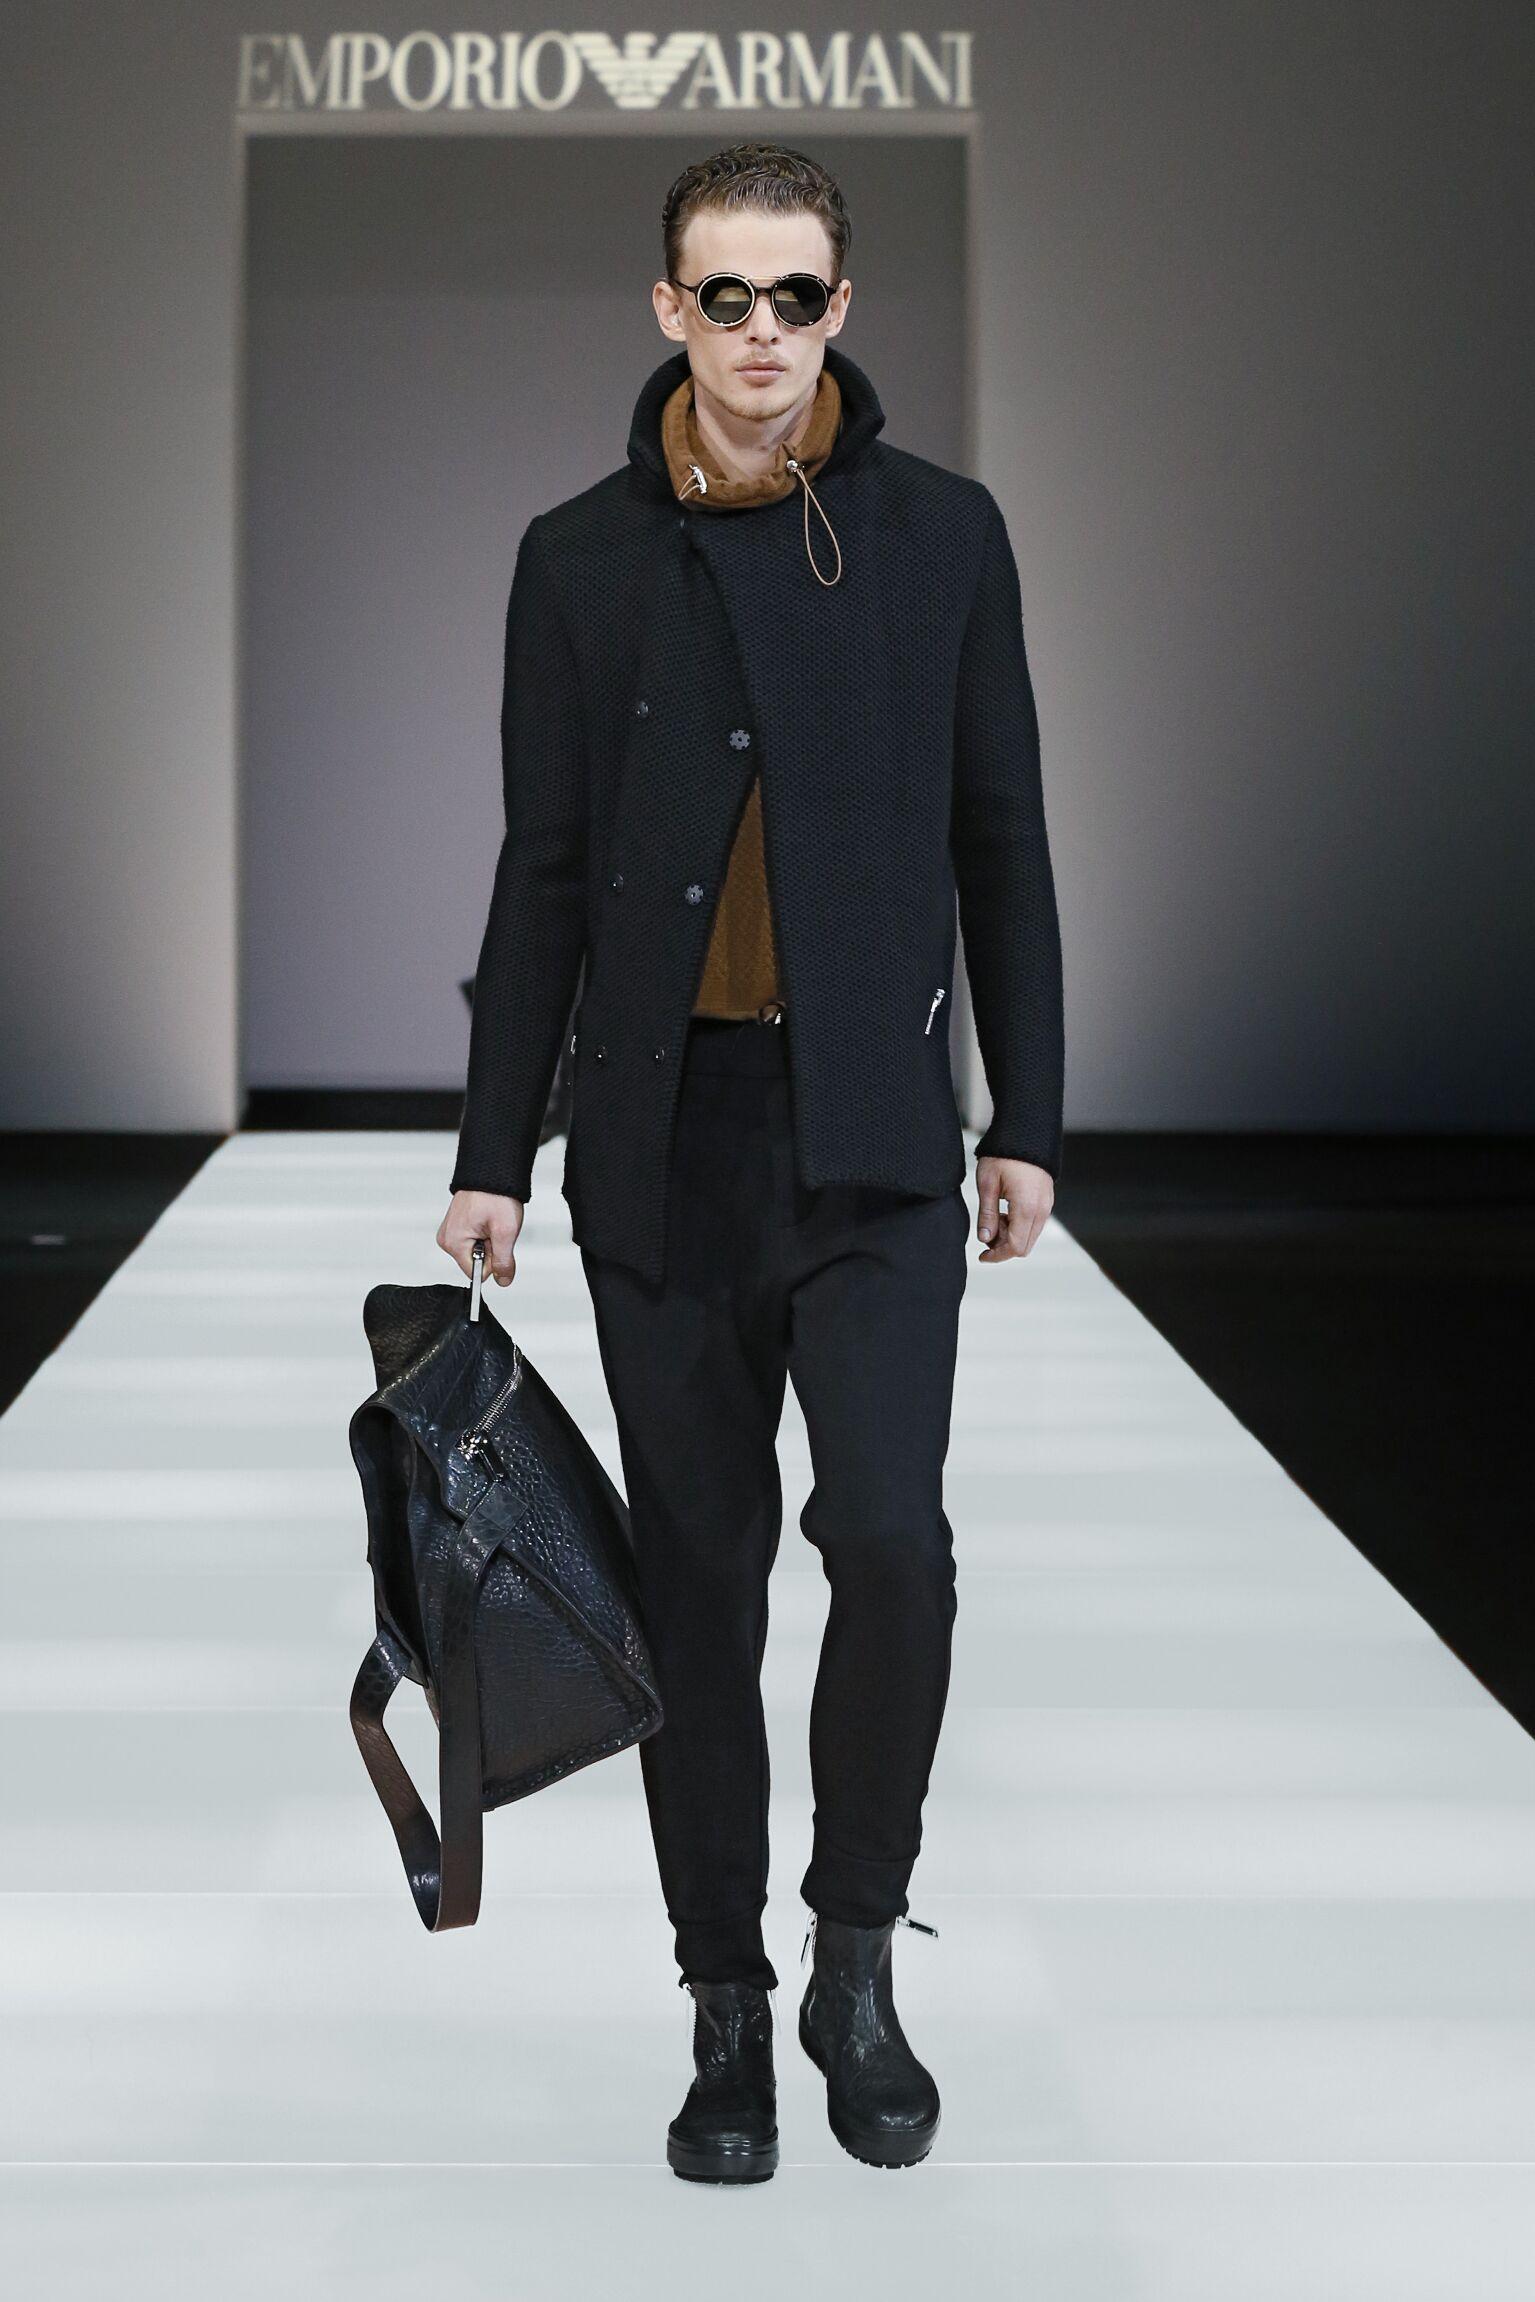 Winter 2015 Man Trends Emporio Armani Collection